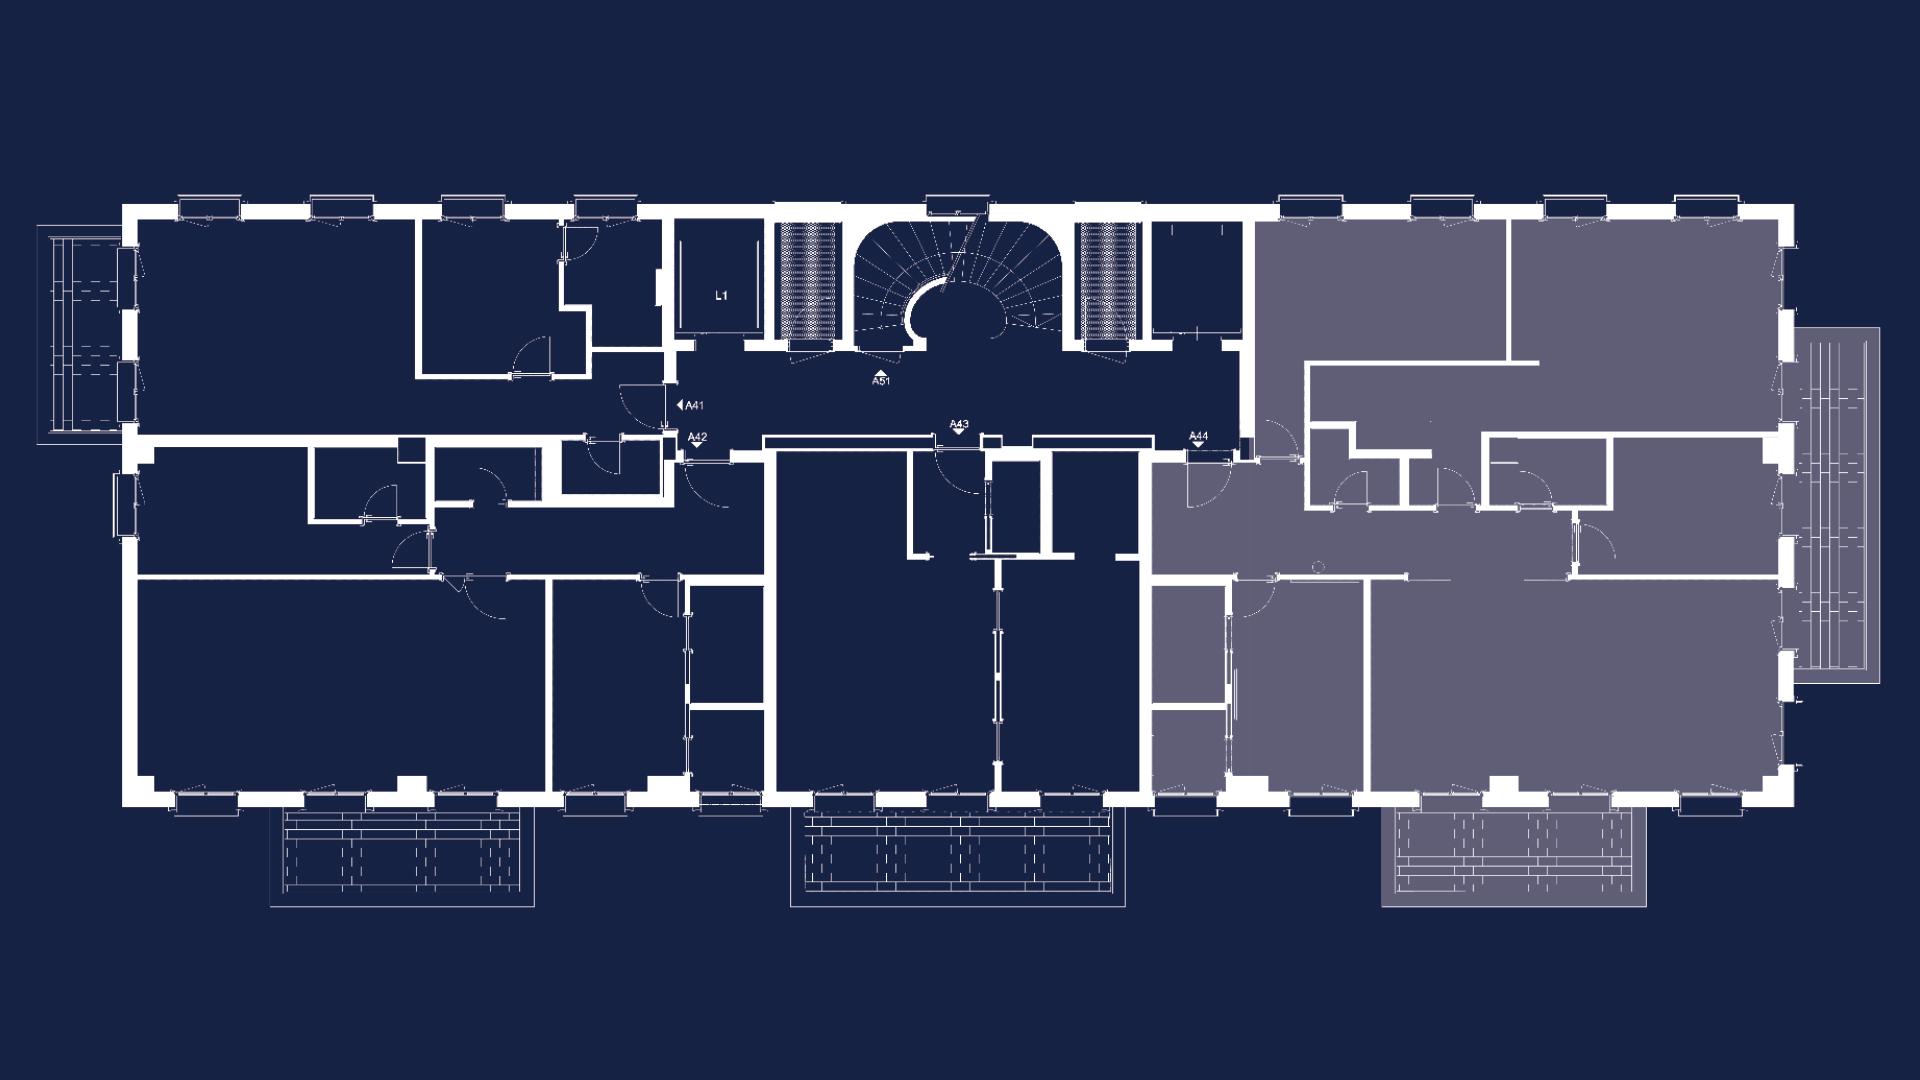 https://generalinvest.me/upl/2020/08/A44_mapa.jpg